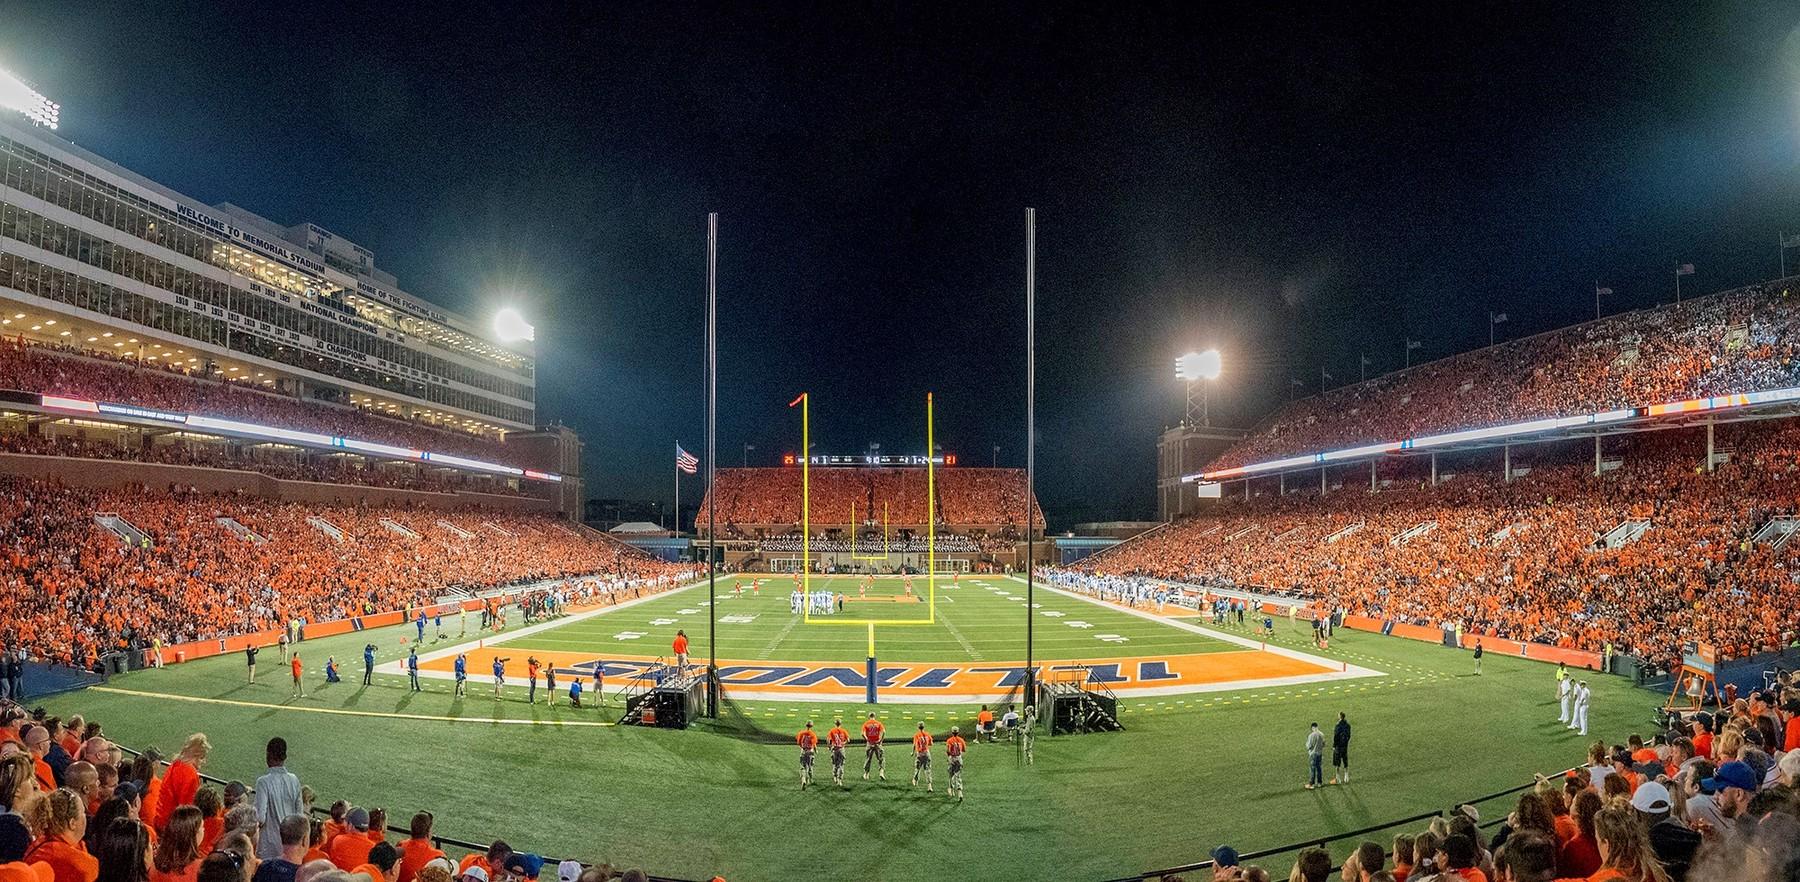 Memorial Stadium on a game night